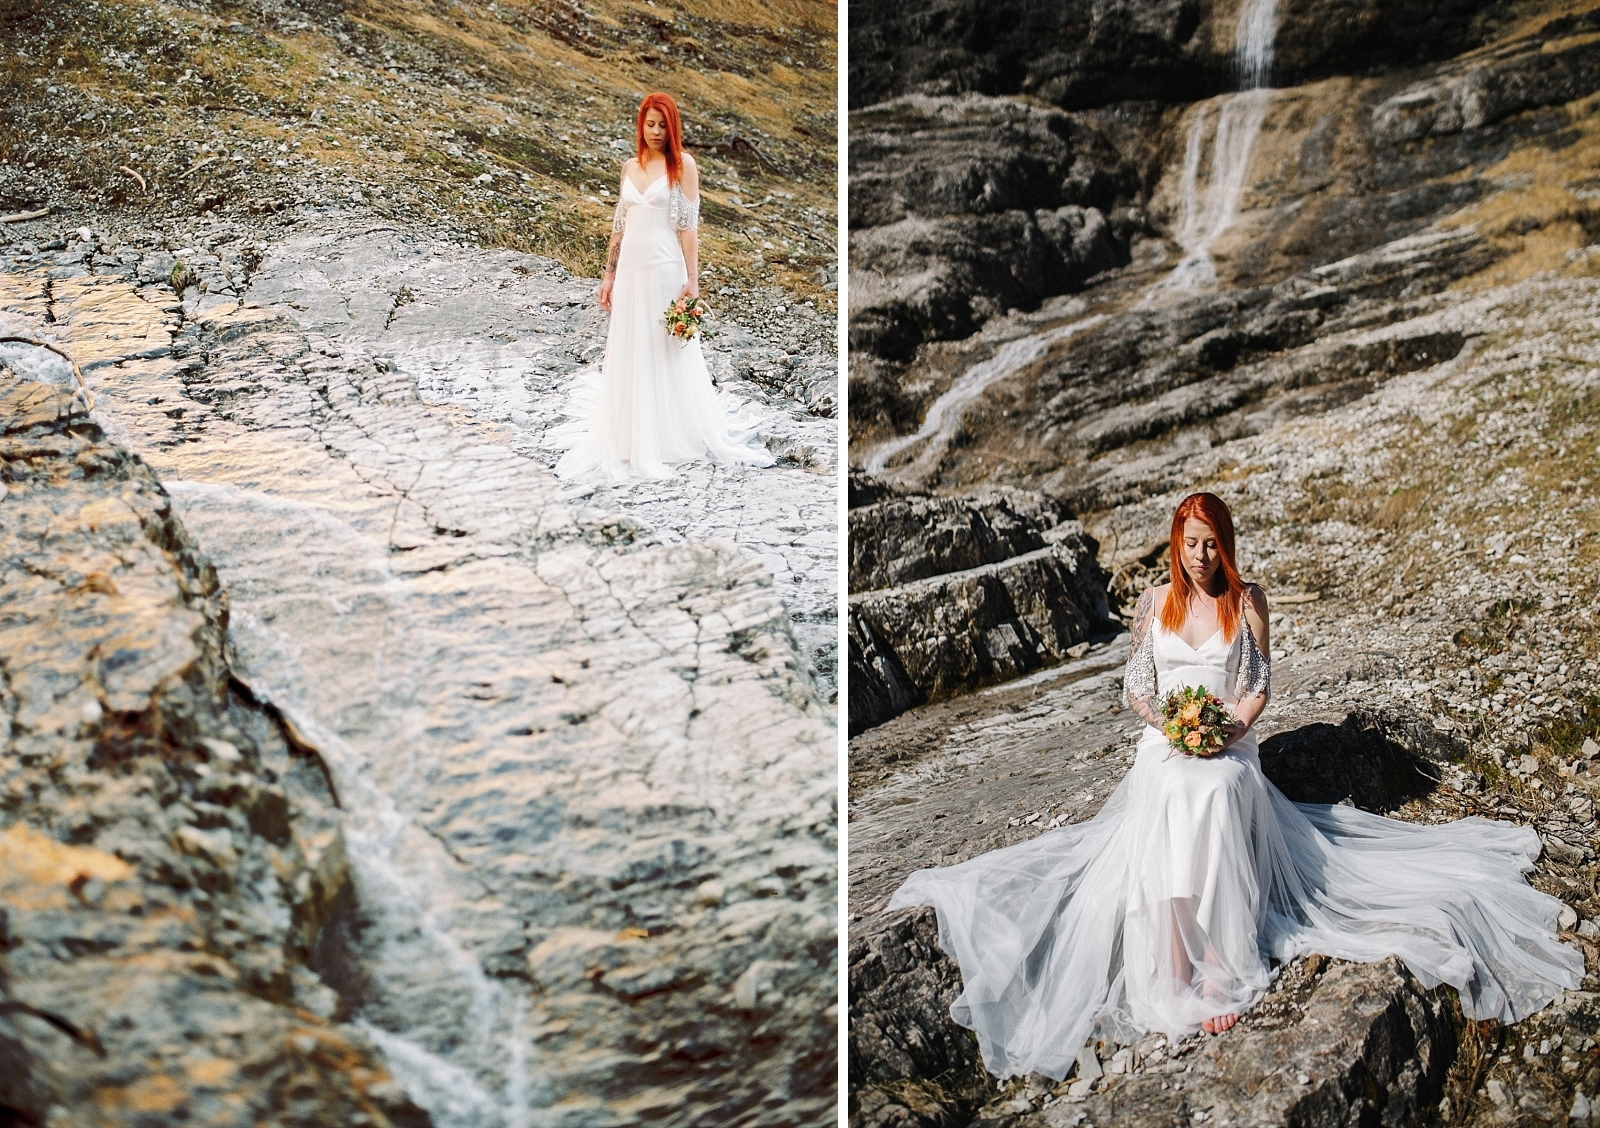 Braut am Wasserfall